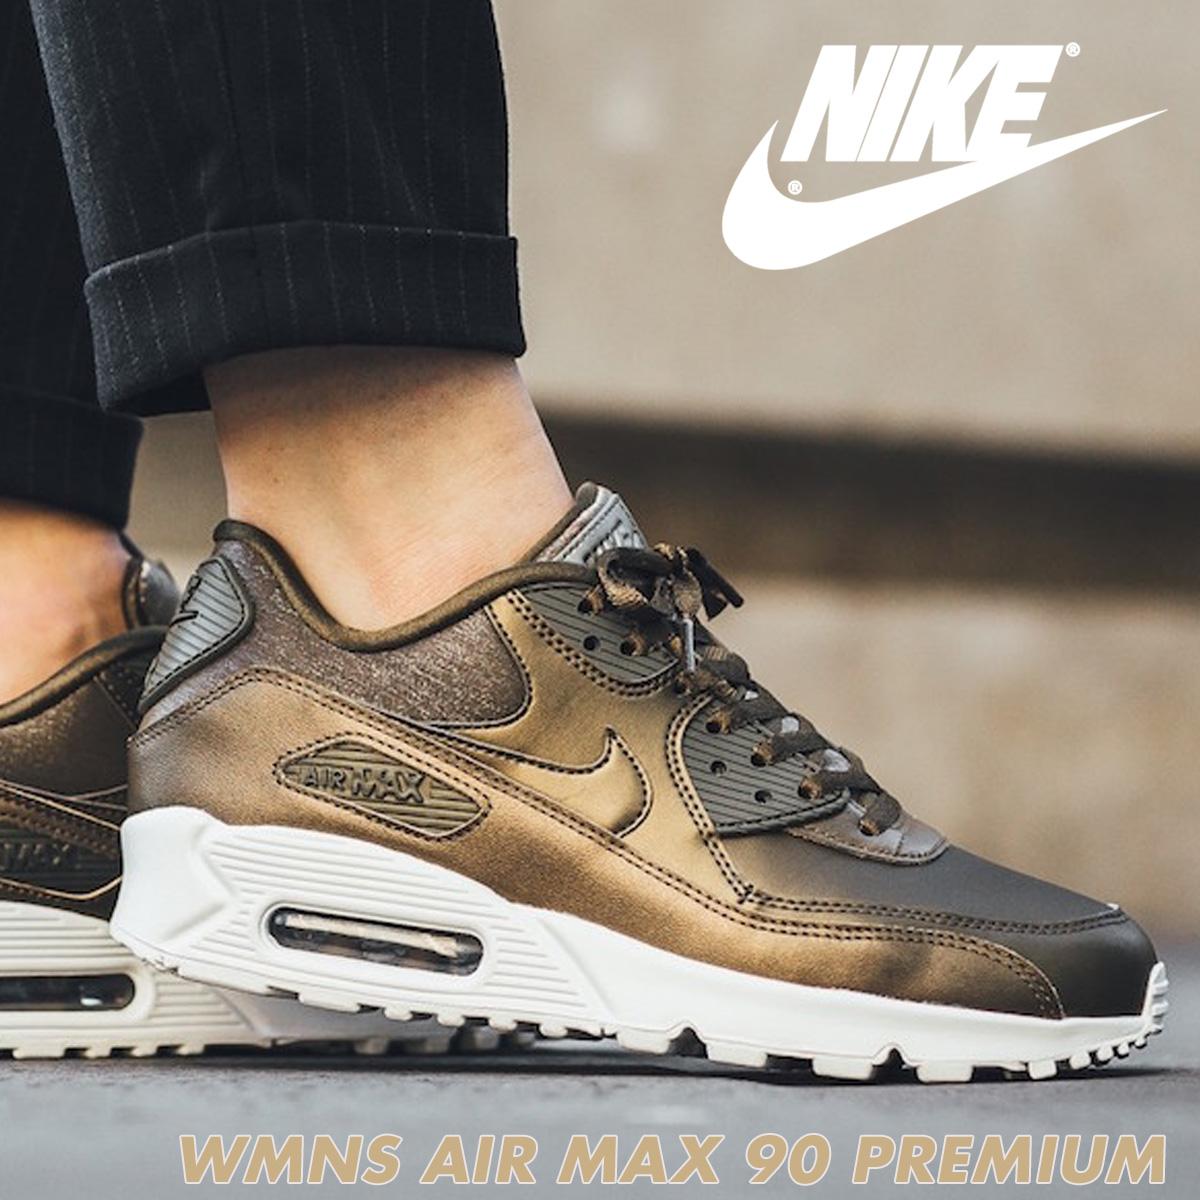 size 40 810e3 a3b91 Nike NIKE Air Max 90 Ladys sneakers WMNS AIR MAX 90 PREMIUM 896,497-901  shoes brown 1023 Shinnyu load